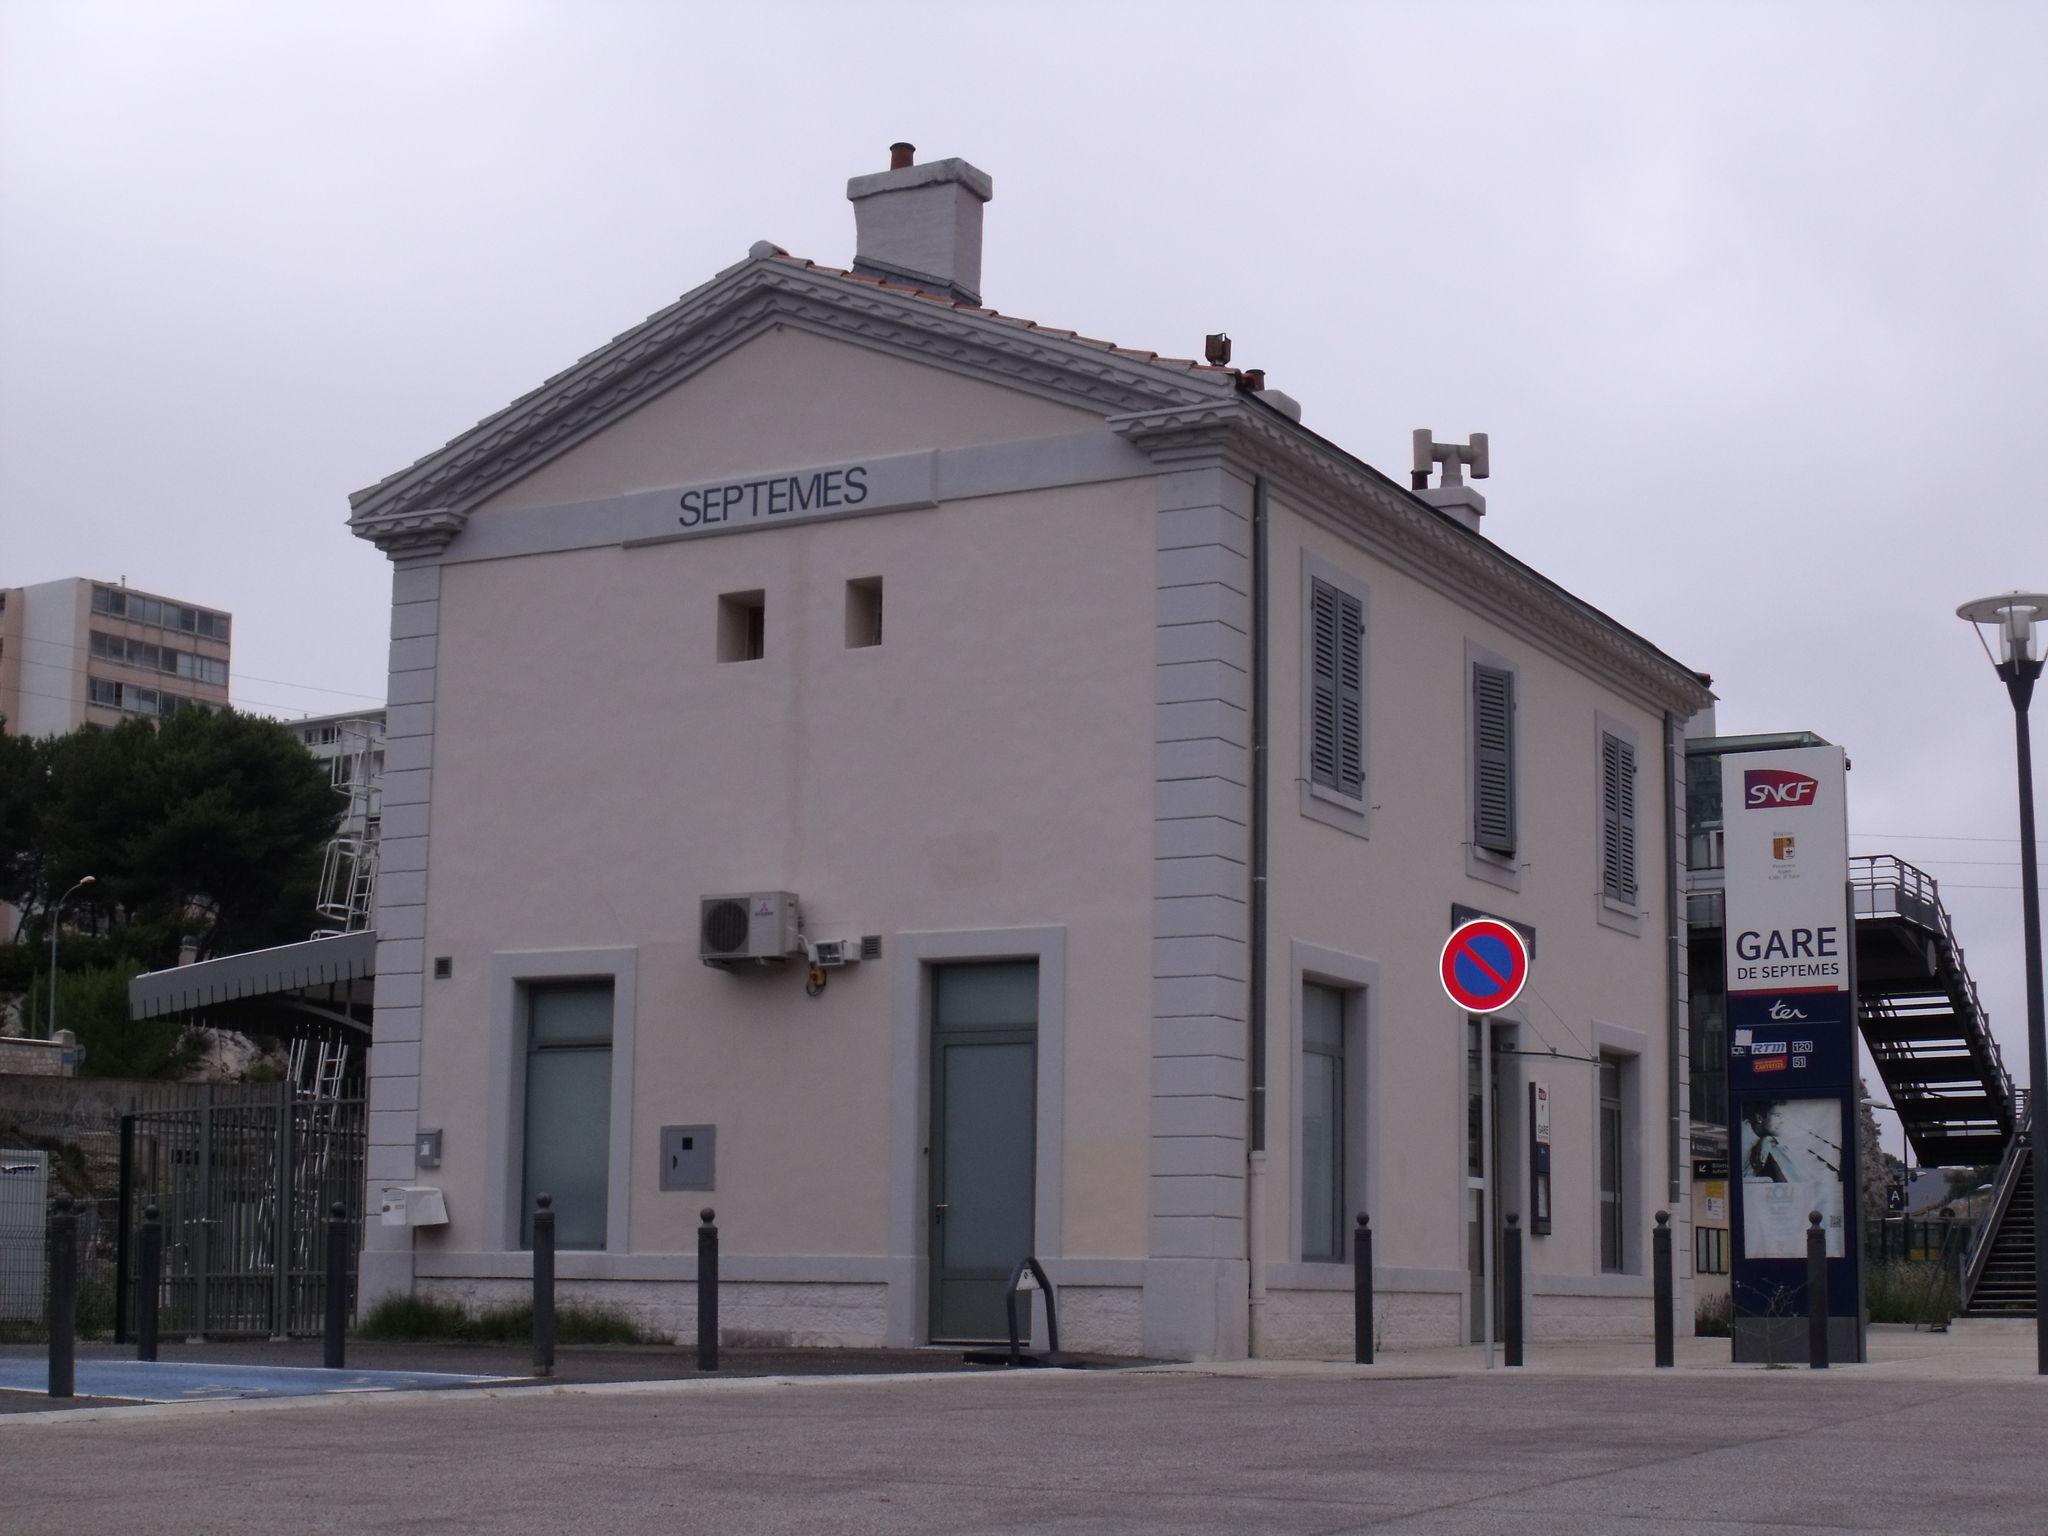 Septèmes (Bouches-du-Rhône)